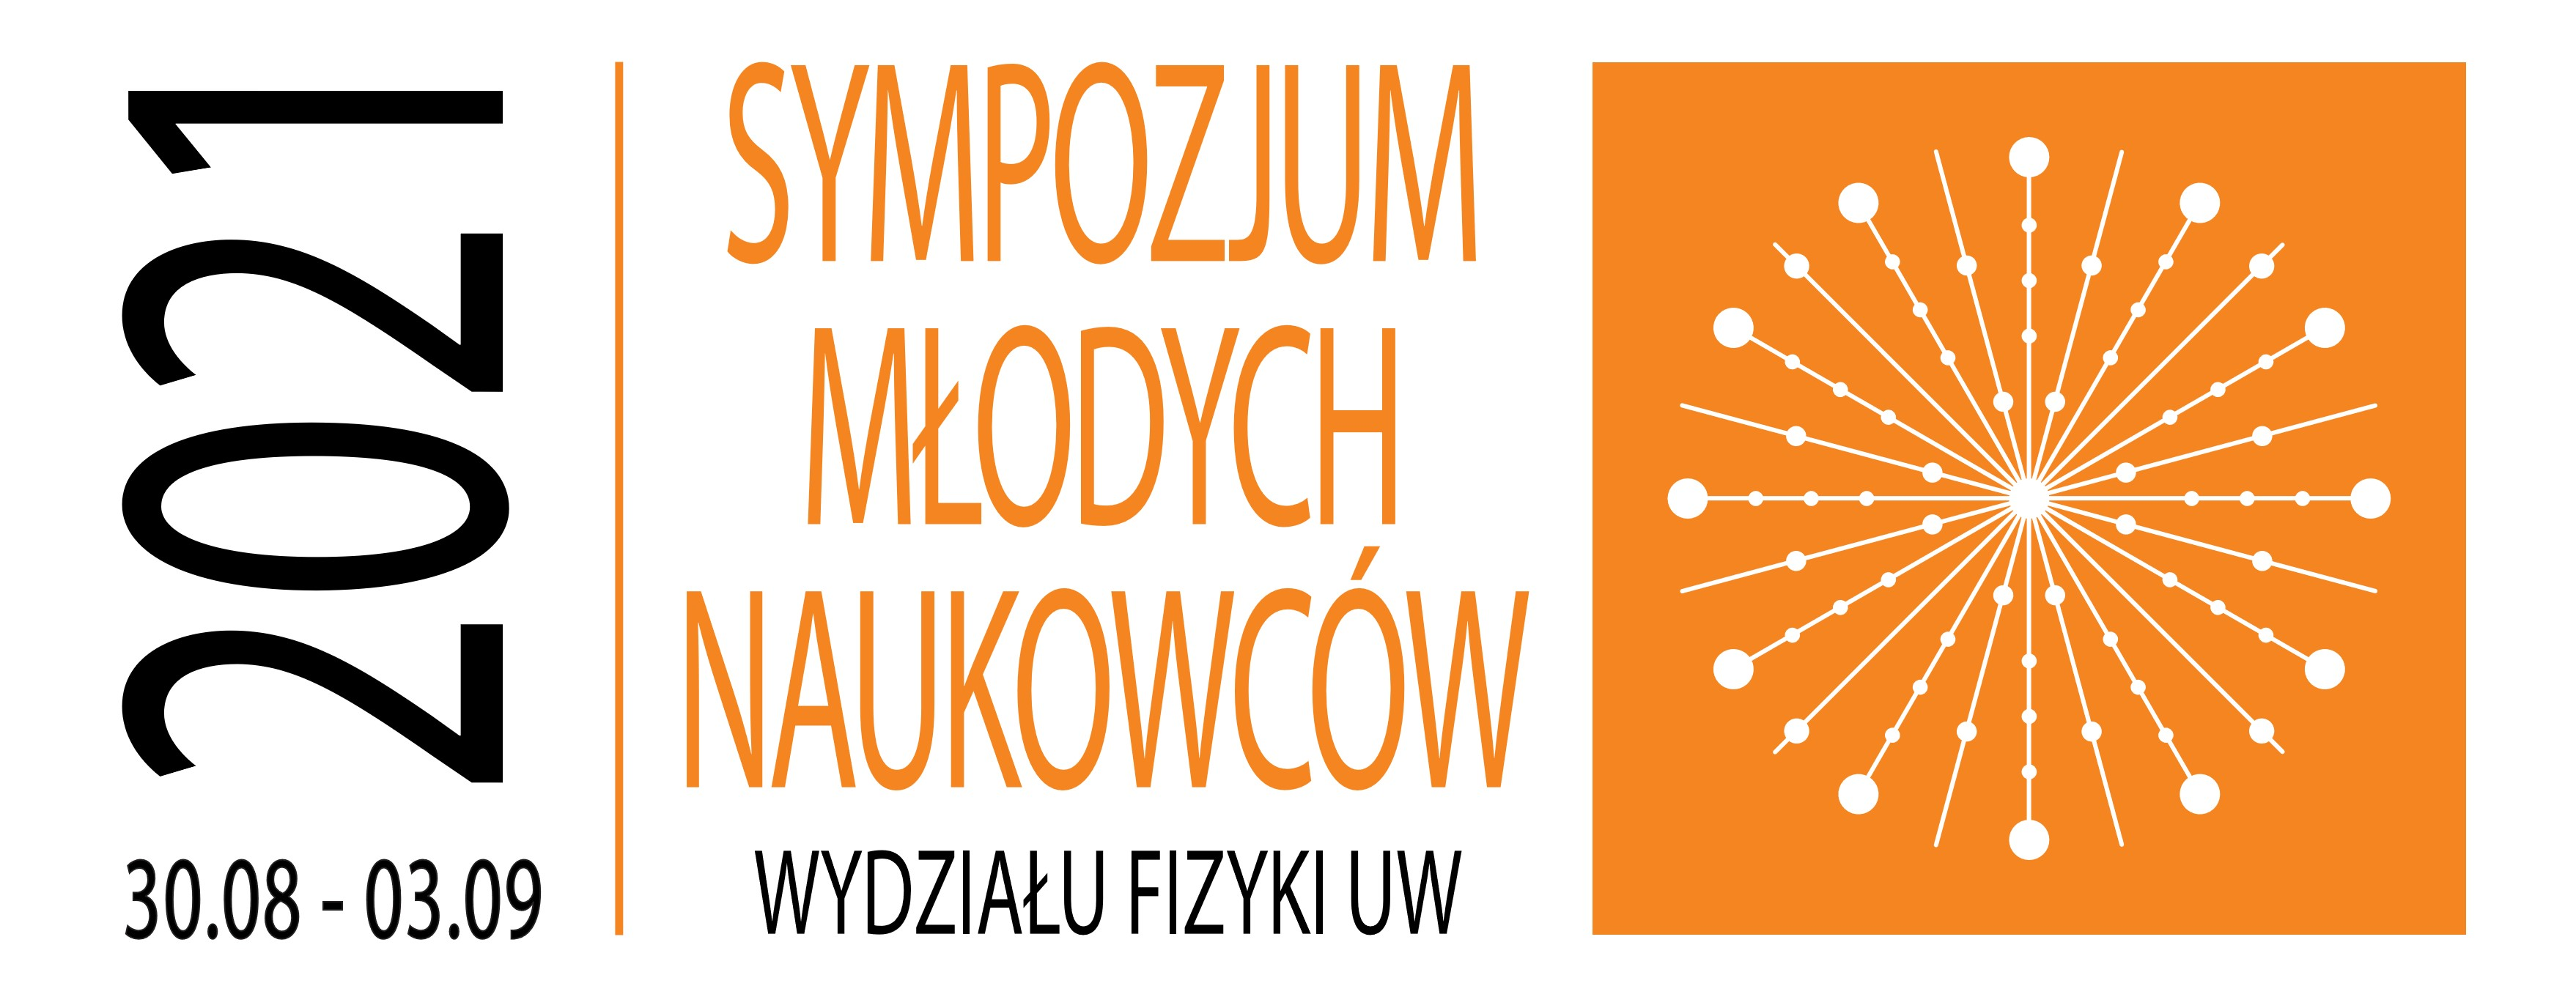 SMN.fuw.edu.pl